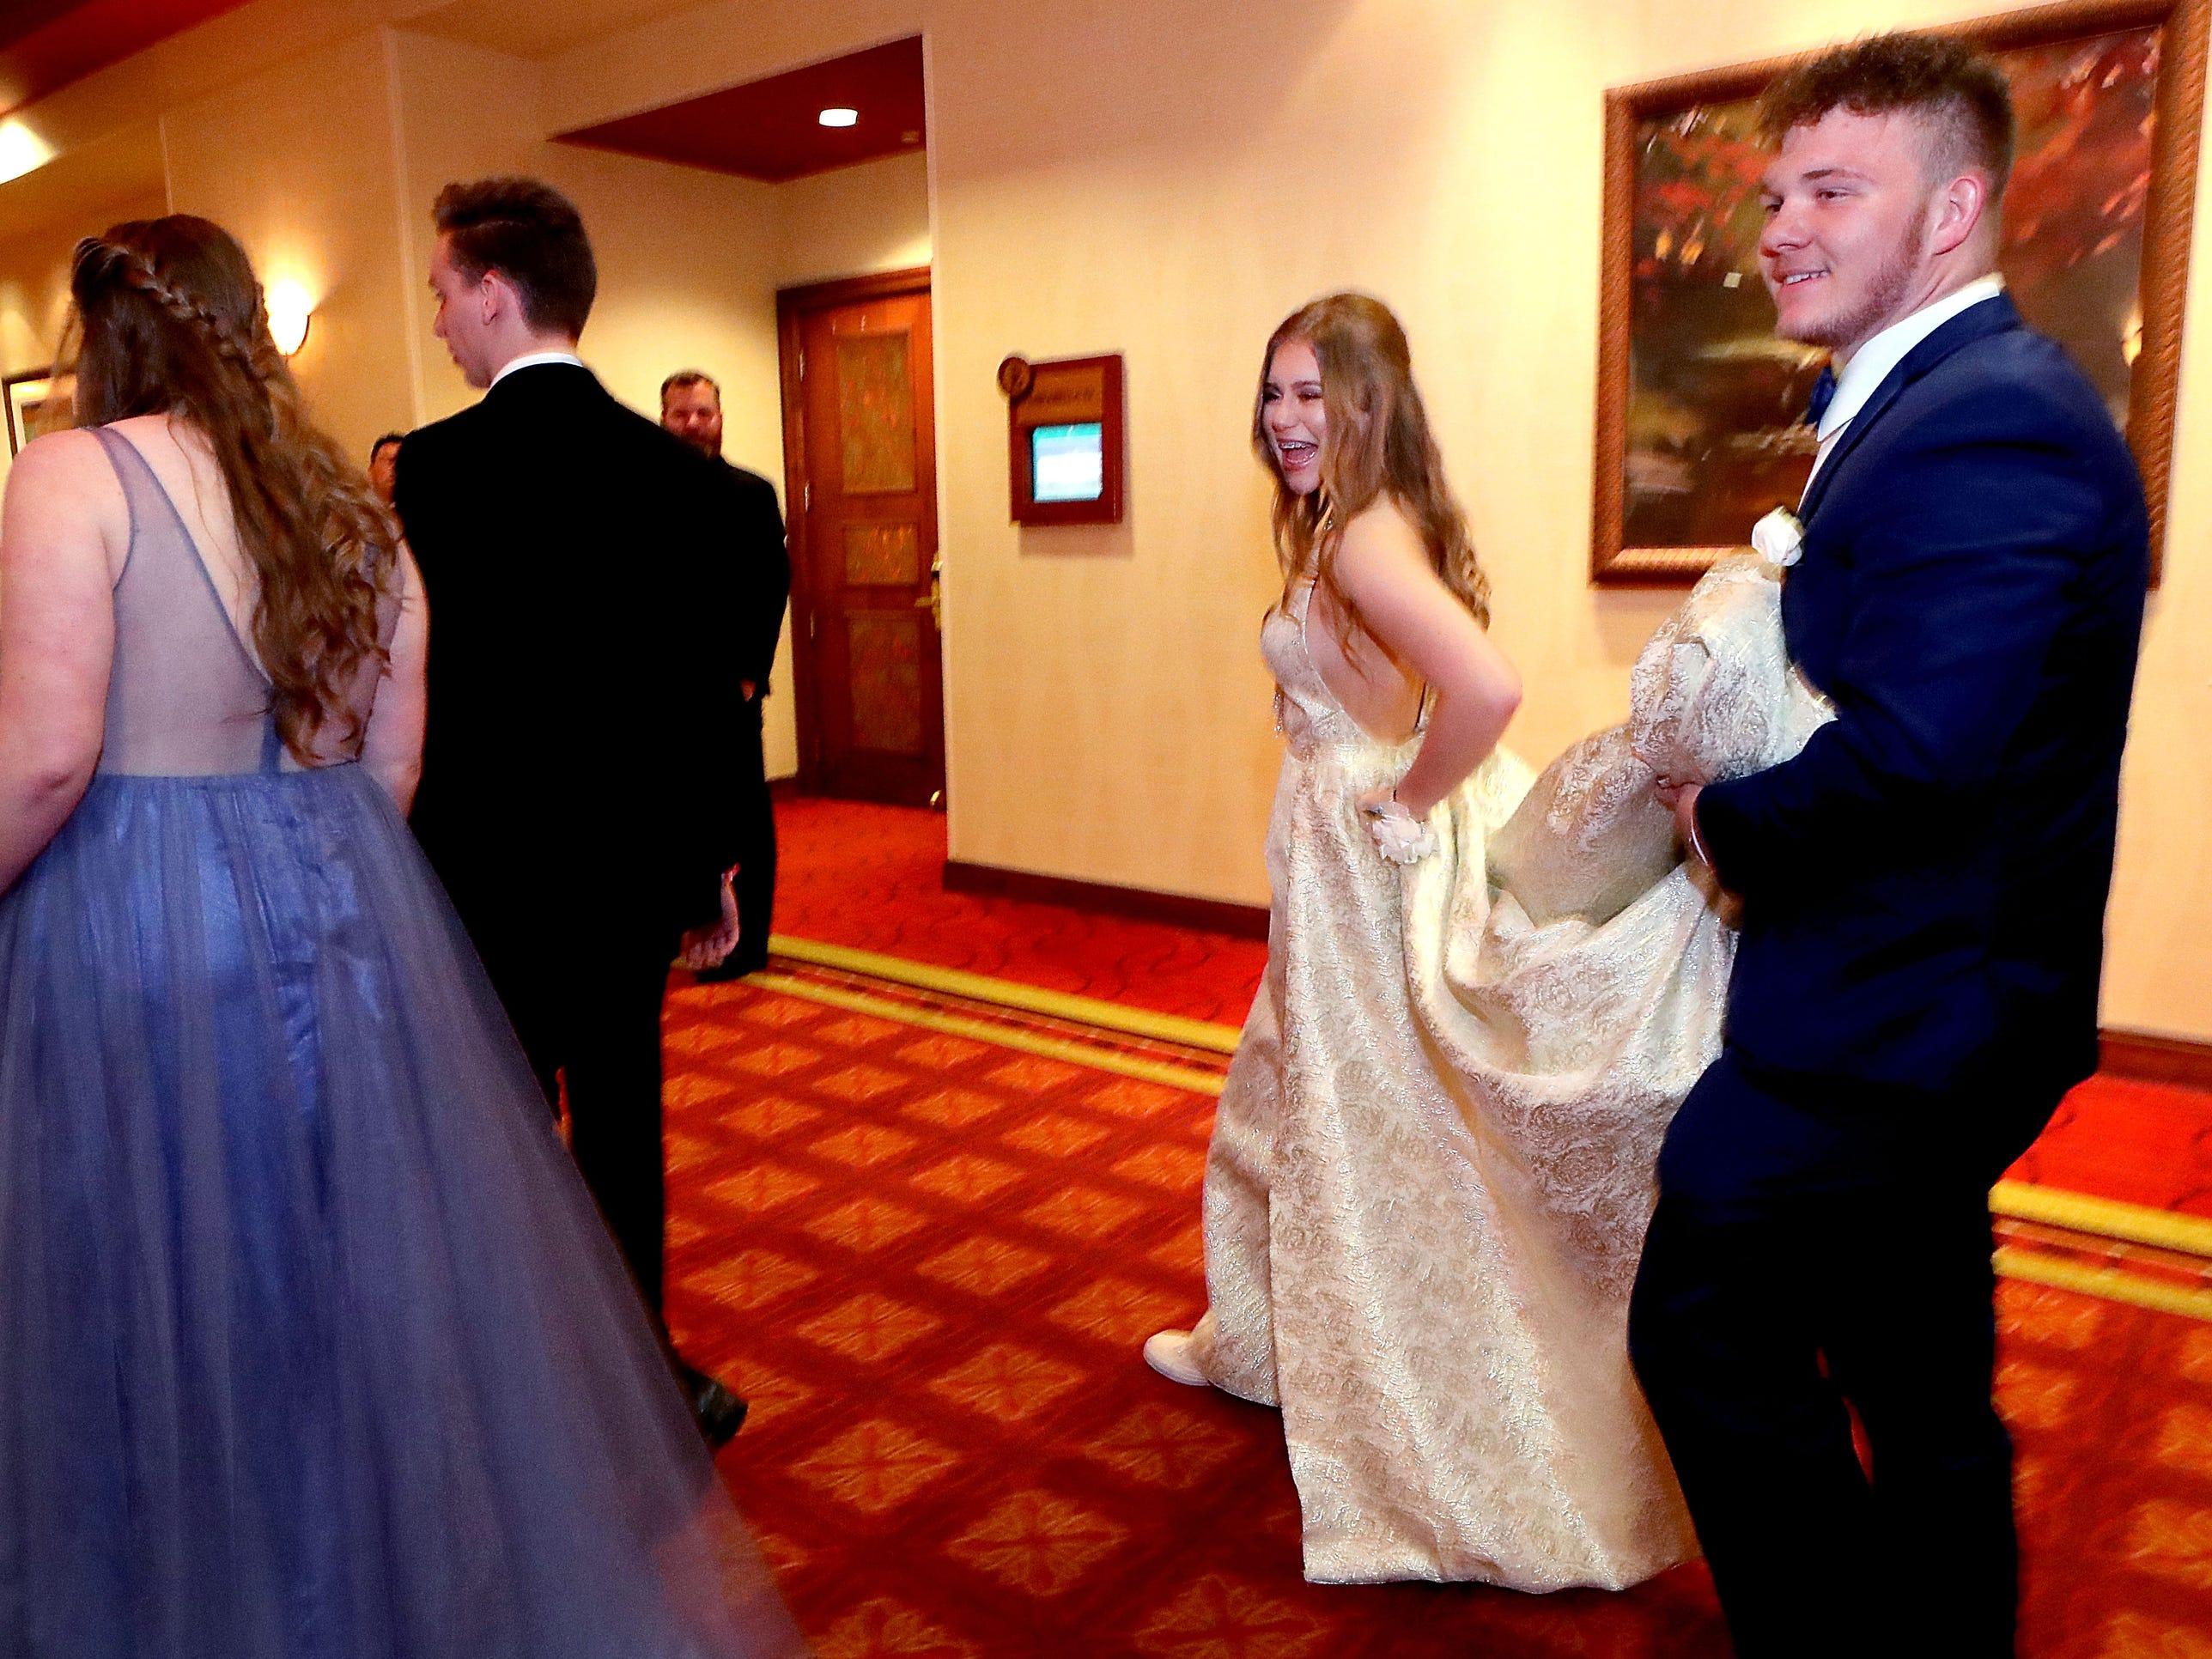 Carl Gudvangen holds Hannah Batt's dress off the ground as she walks into Eagleville's Prom held at Embassy Suites, in Murfreesboro on Thursday April 5, 2019.